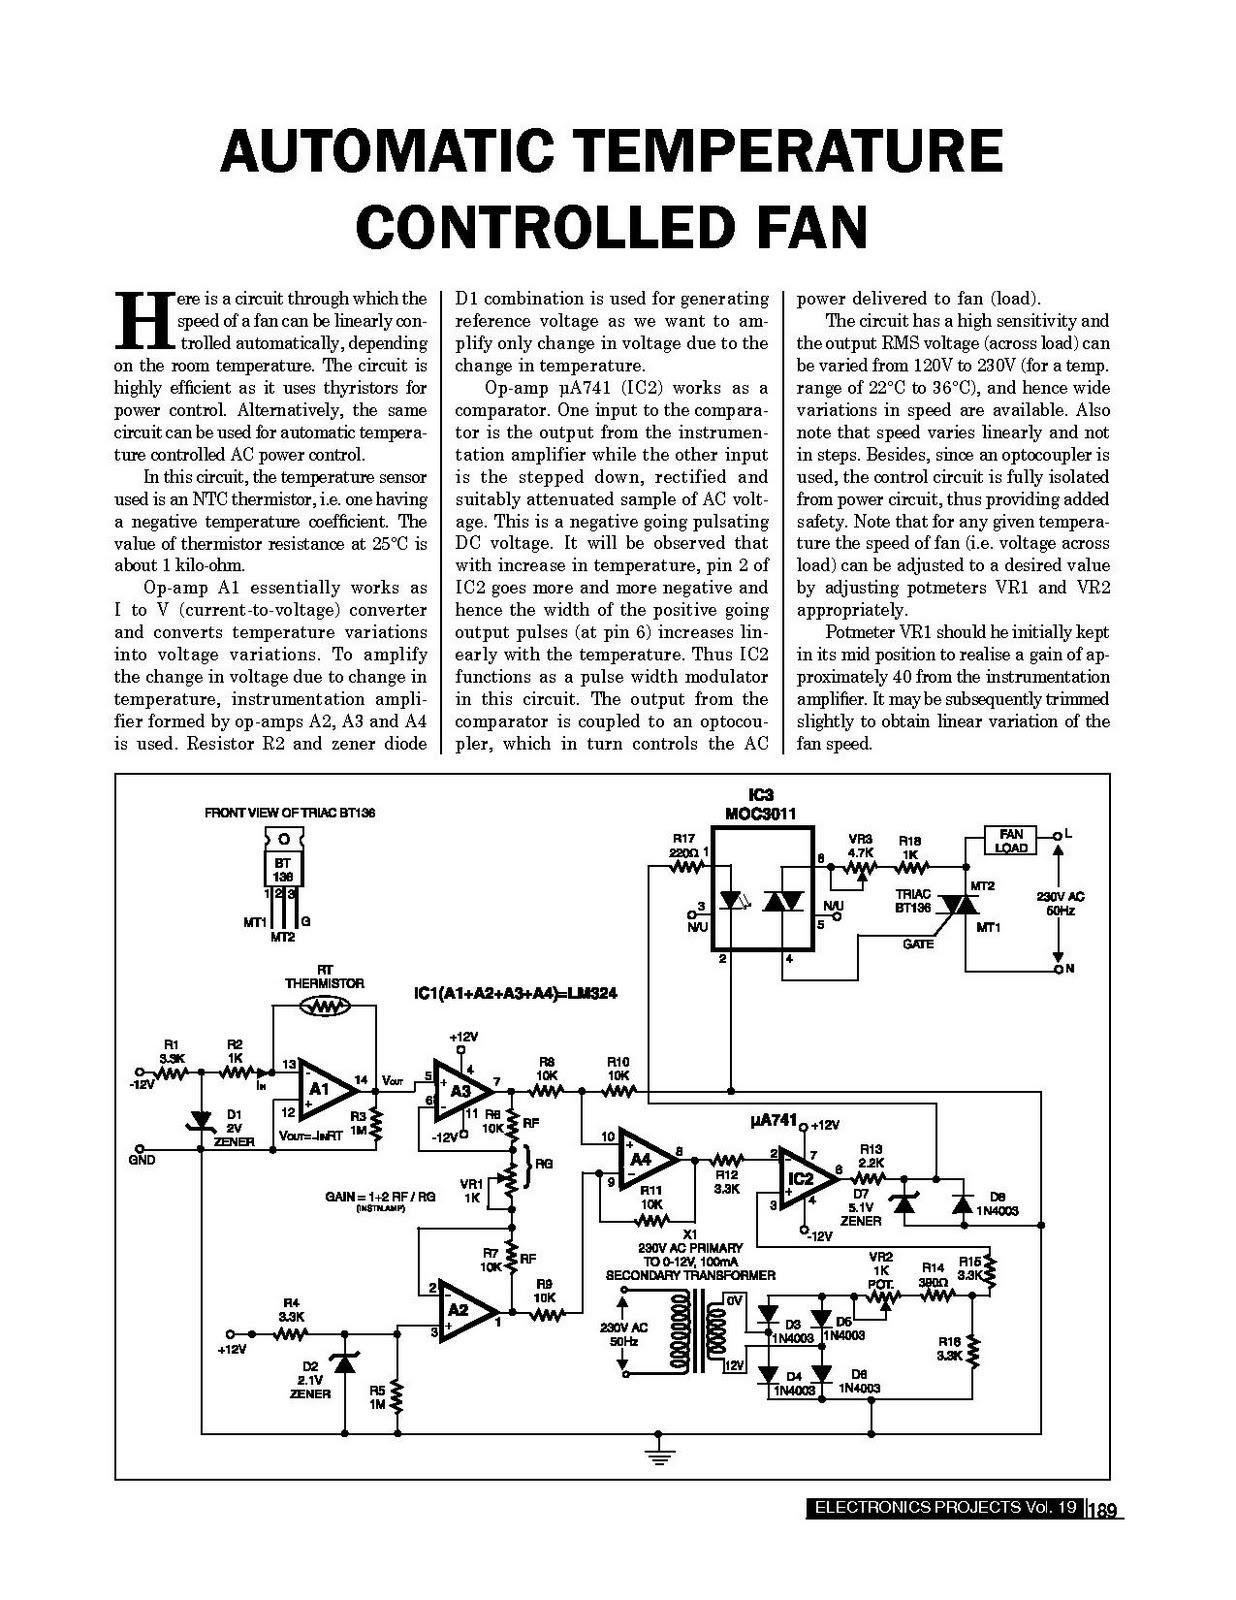 scr model railroading control circuit diagram tradeoficcom wiring scr trigger circuit diagram tradeoficcom [ 1236 x 1600 Pixel ]